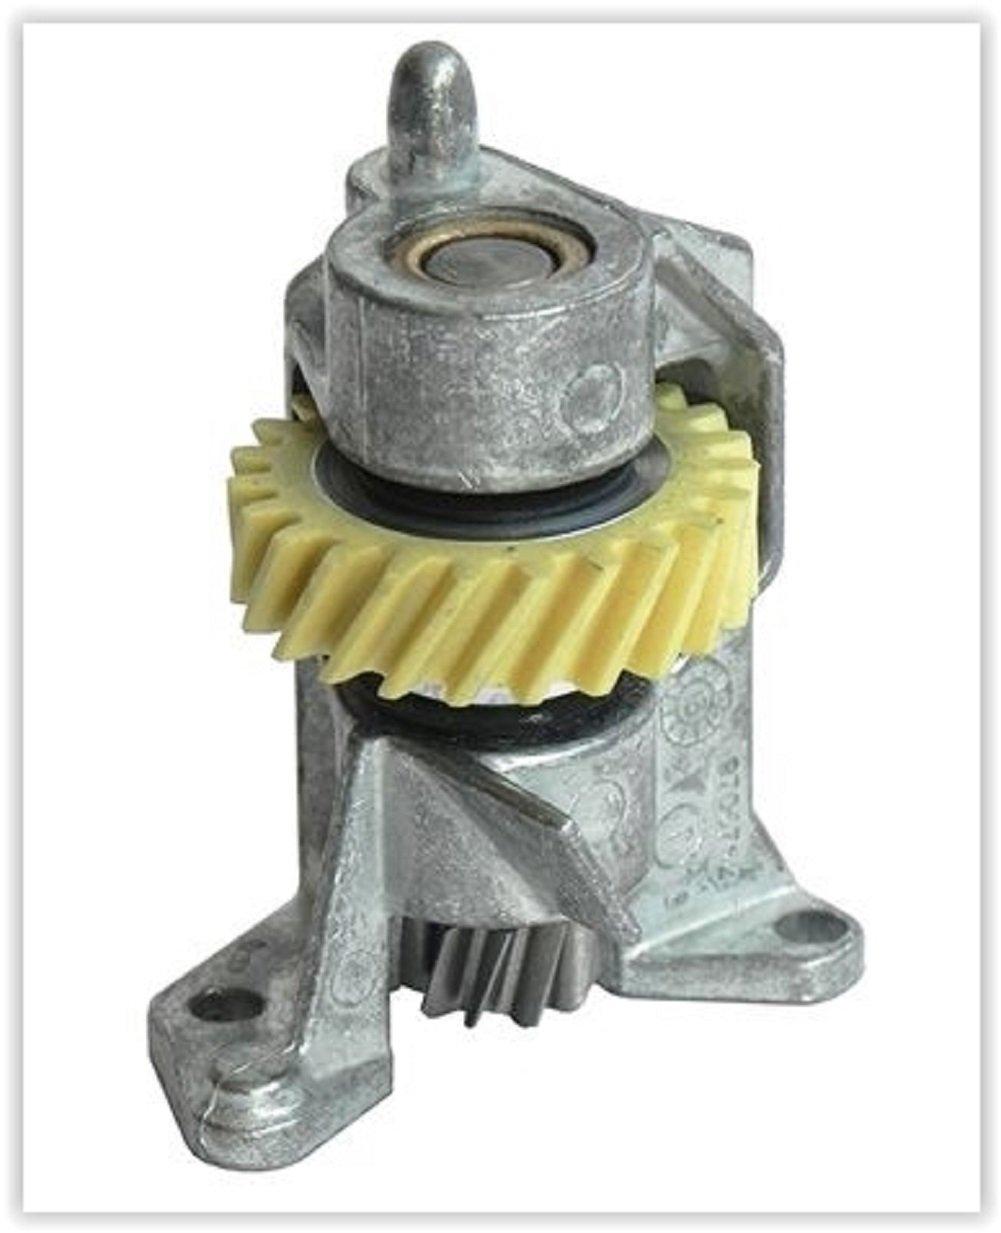 SemBoutique - Brand - KitchenAid - Description - 10/23 Teeth Pinion Gear Set - 240309-2